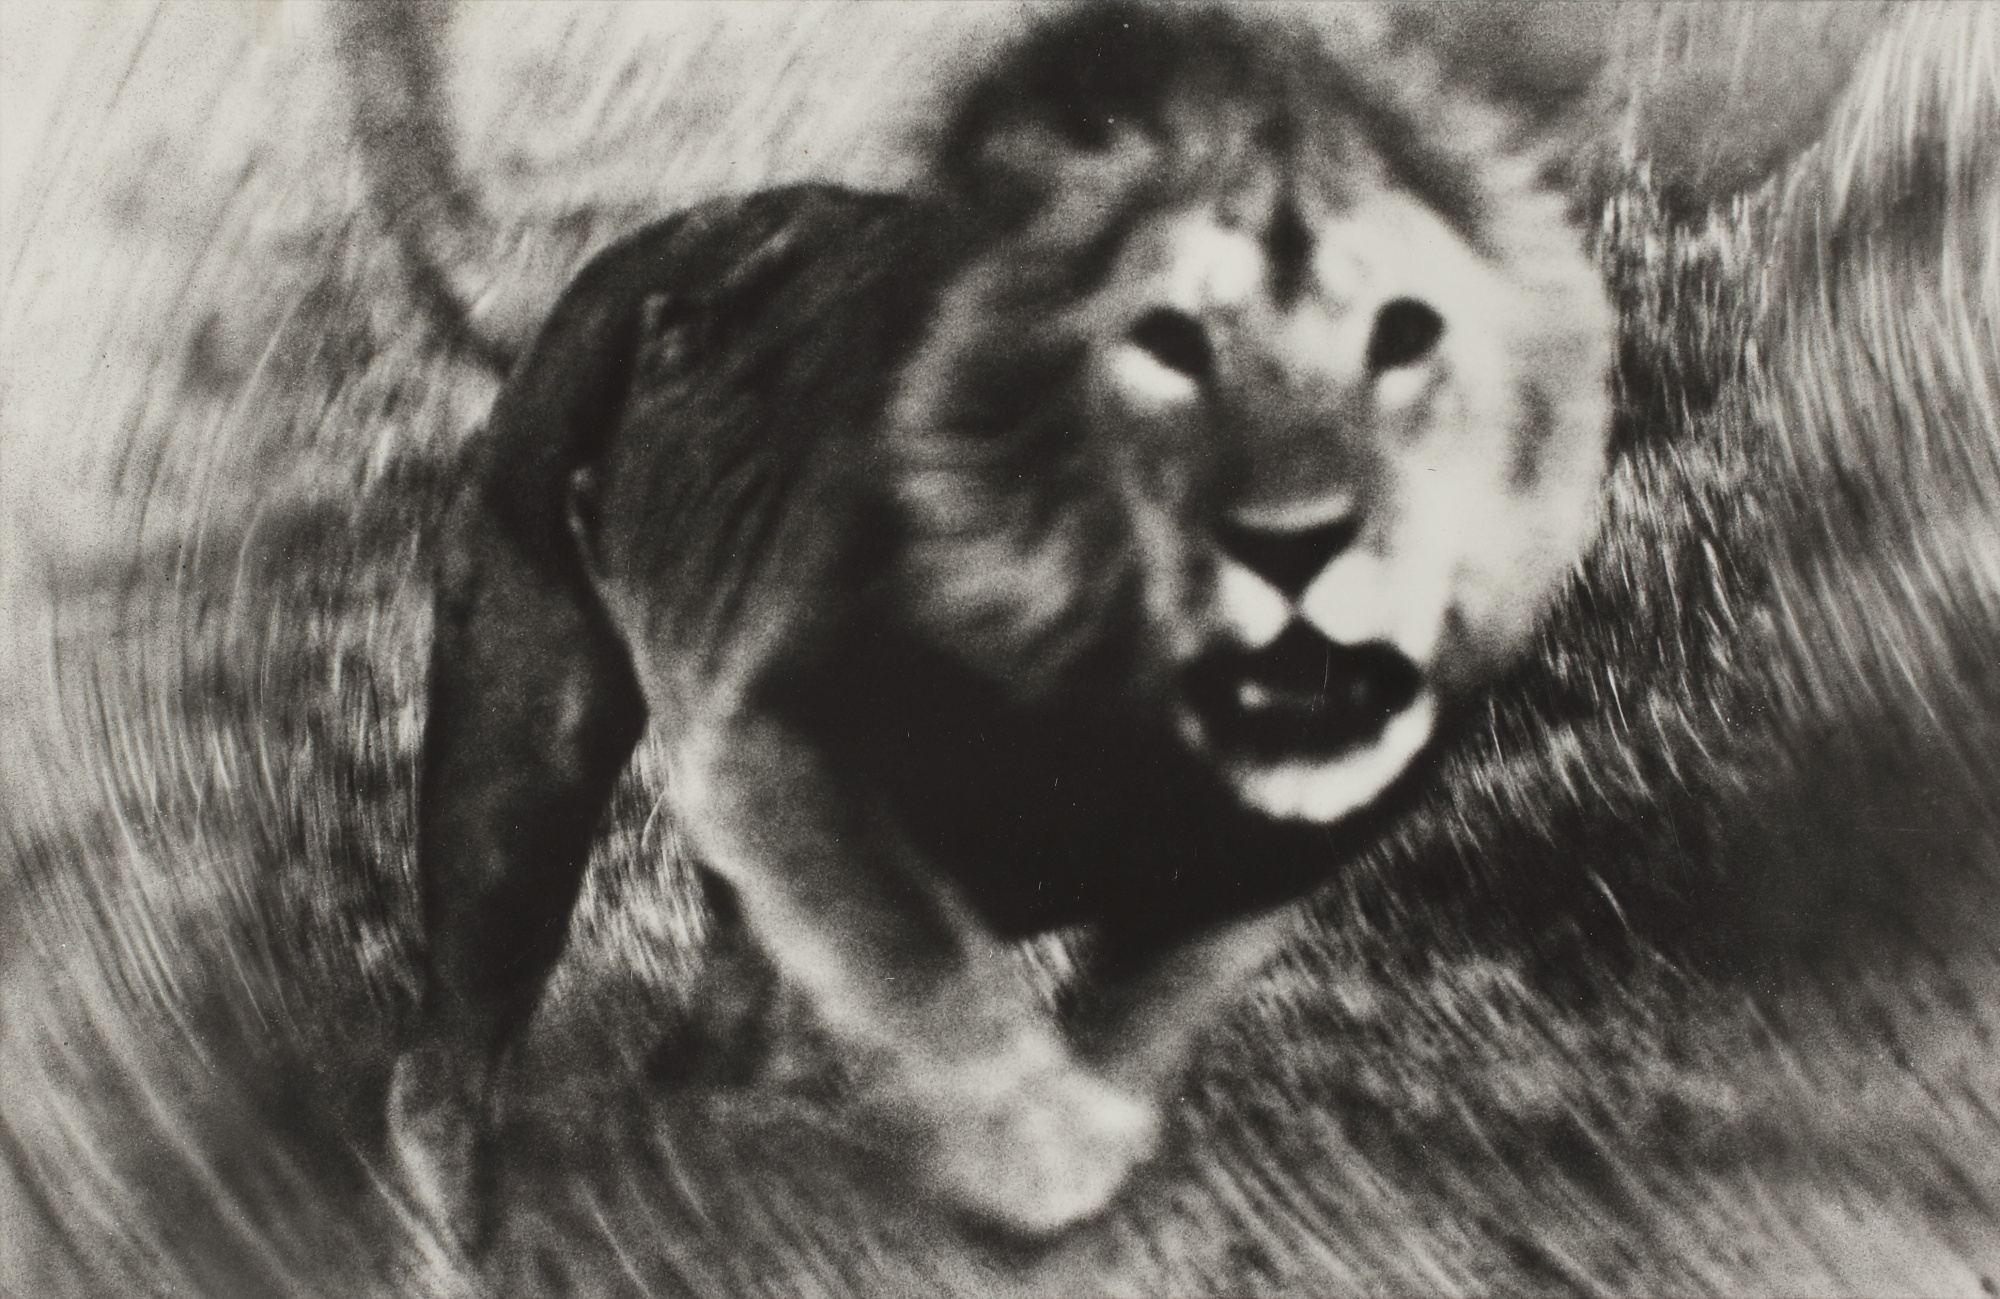 Peter Beard-Loliondo-1964